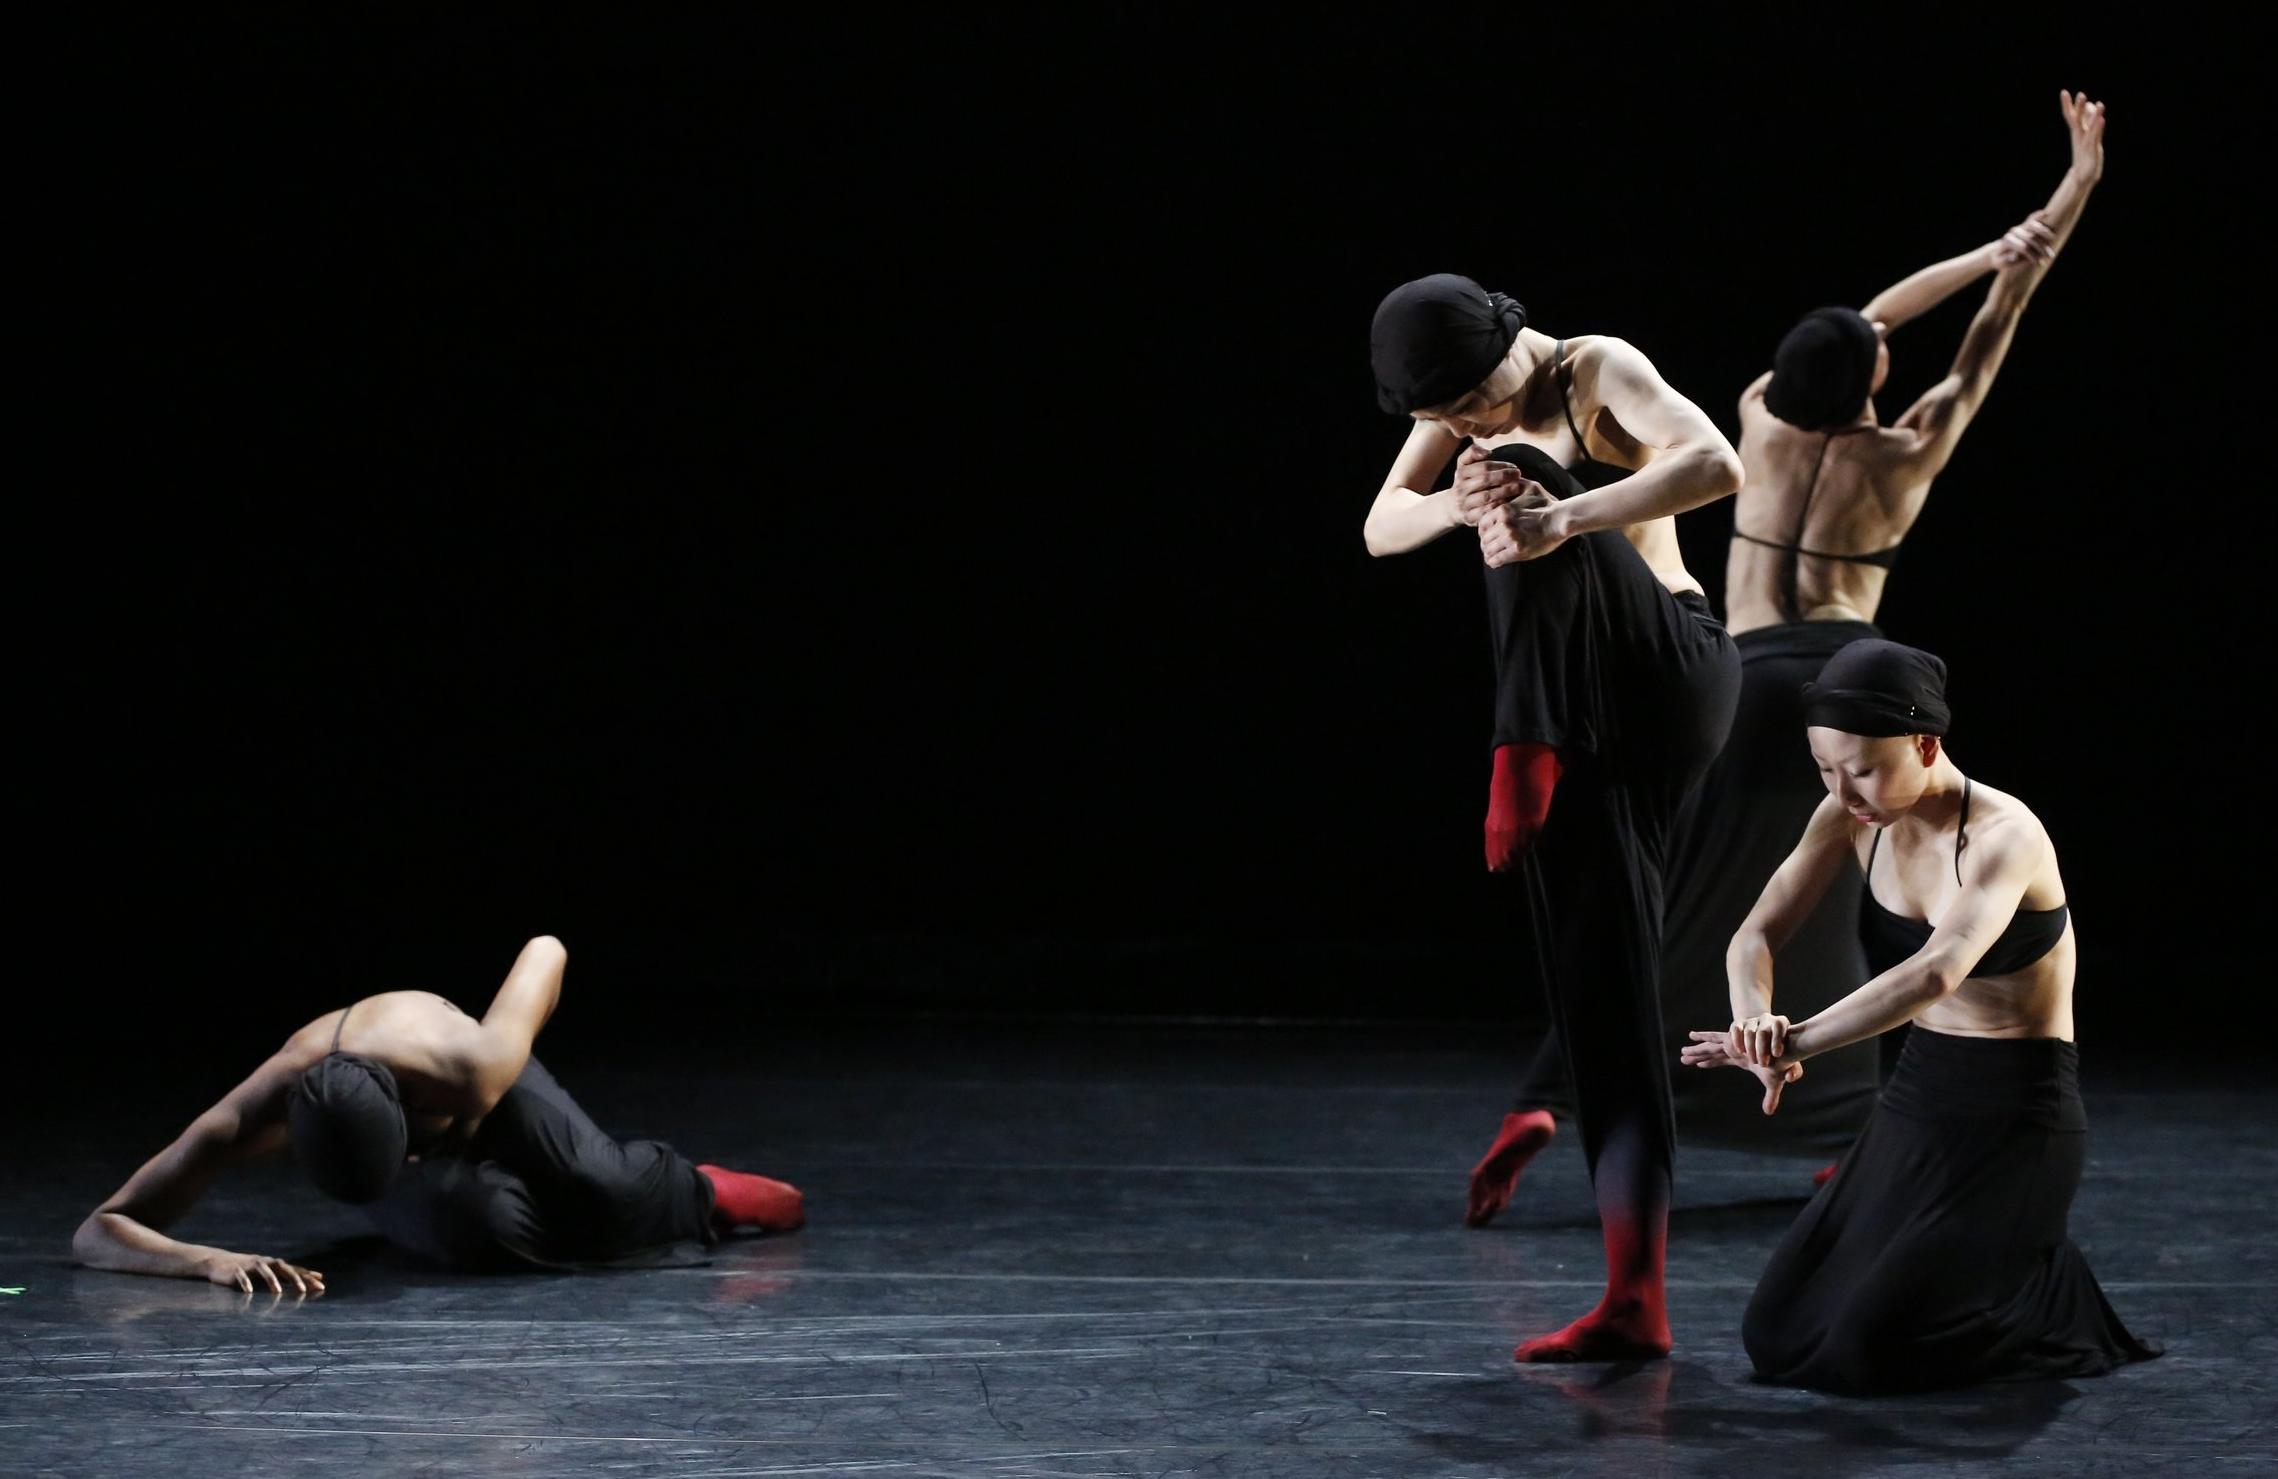 Miserere Nobis (2014) at New York Lives Arts; photo by Carol Rosegg.